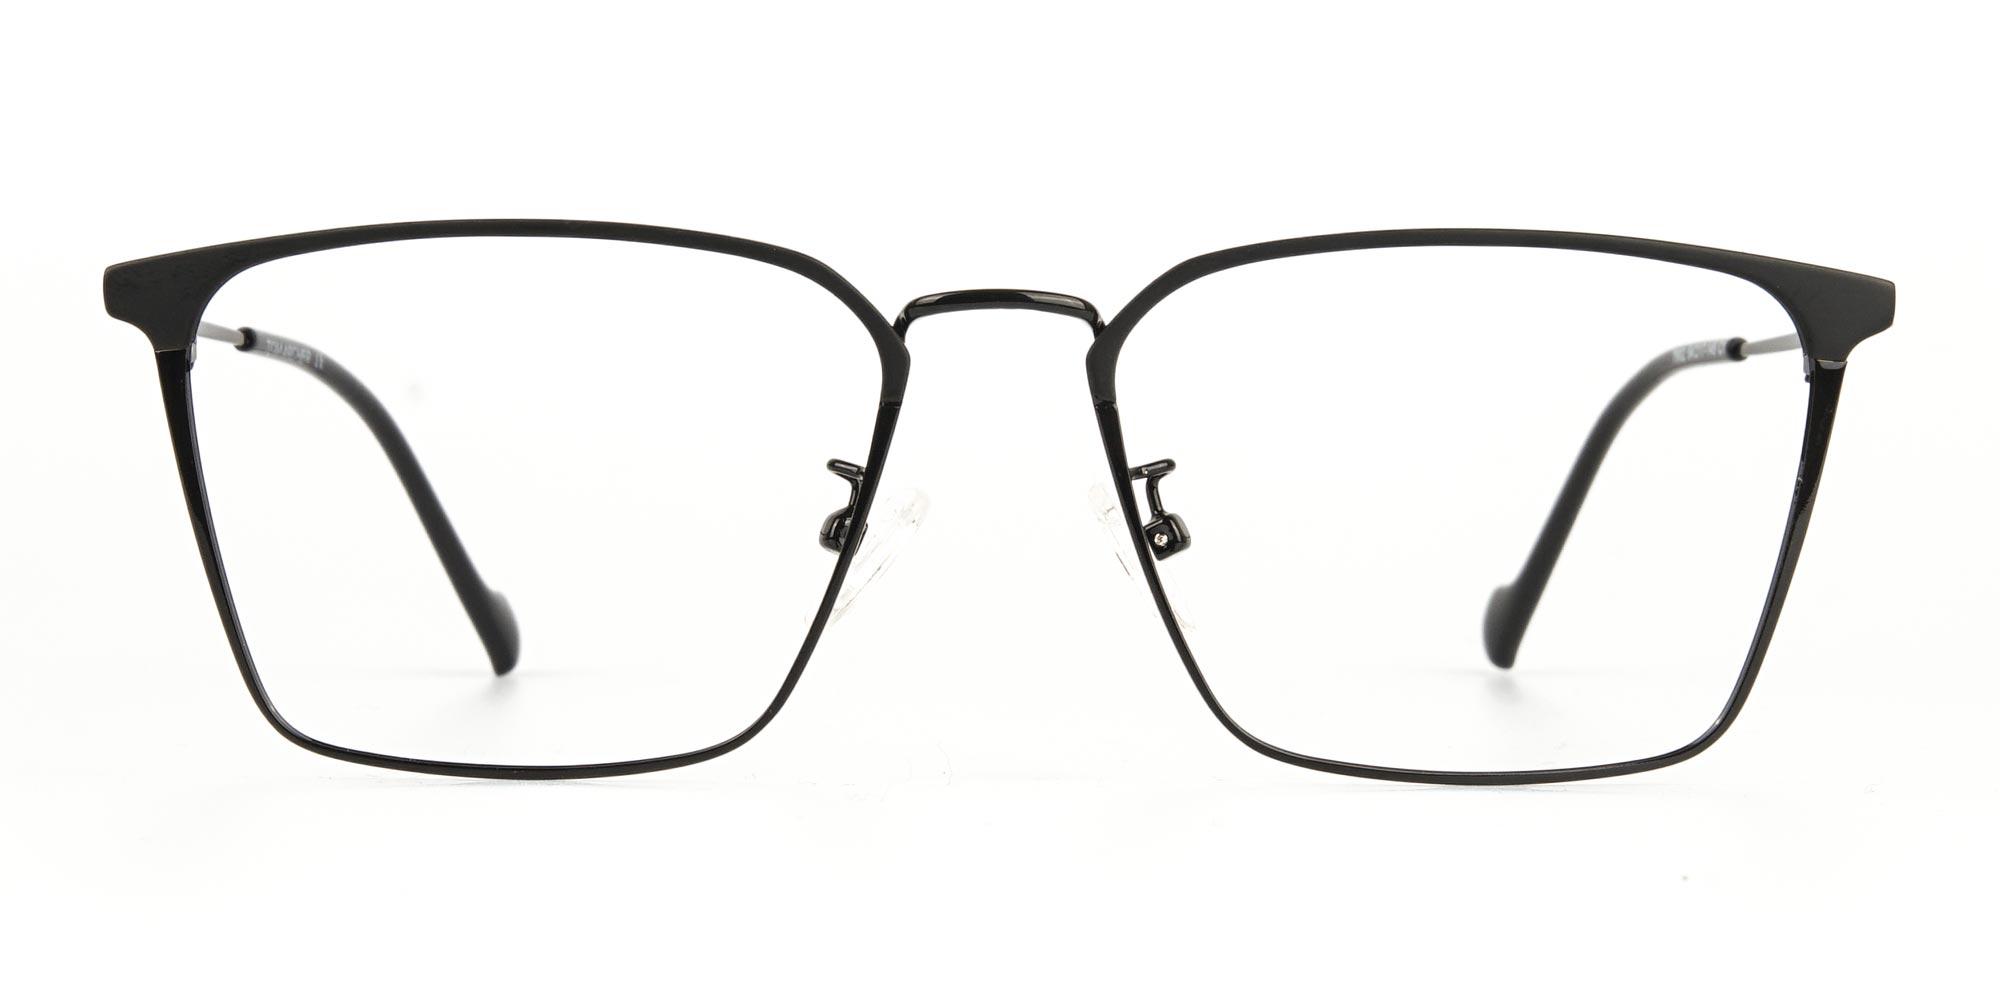 Black Wayfarer Glasses in Lightweight Metal